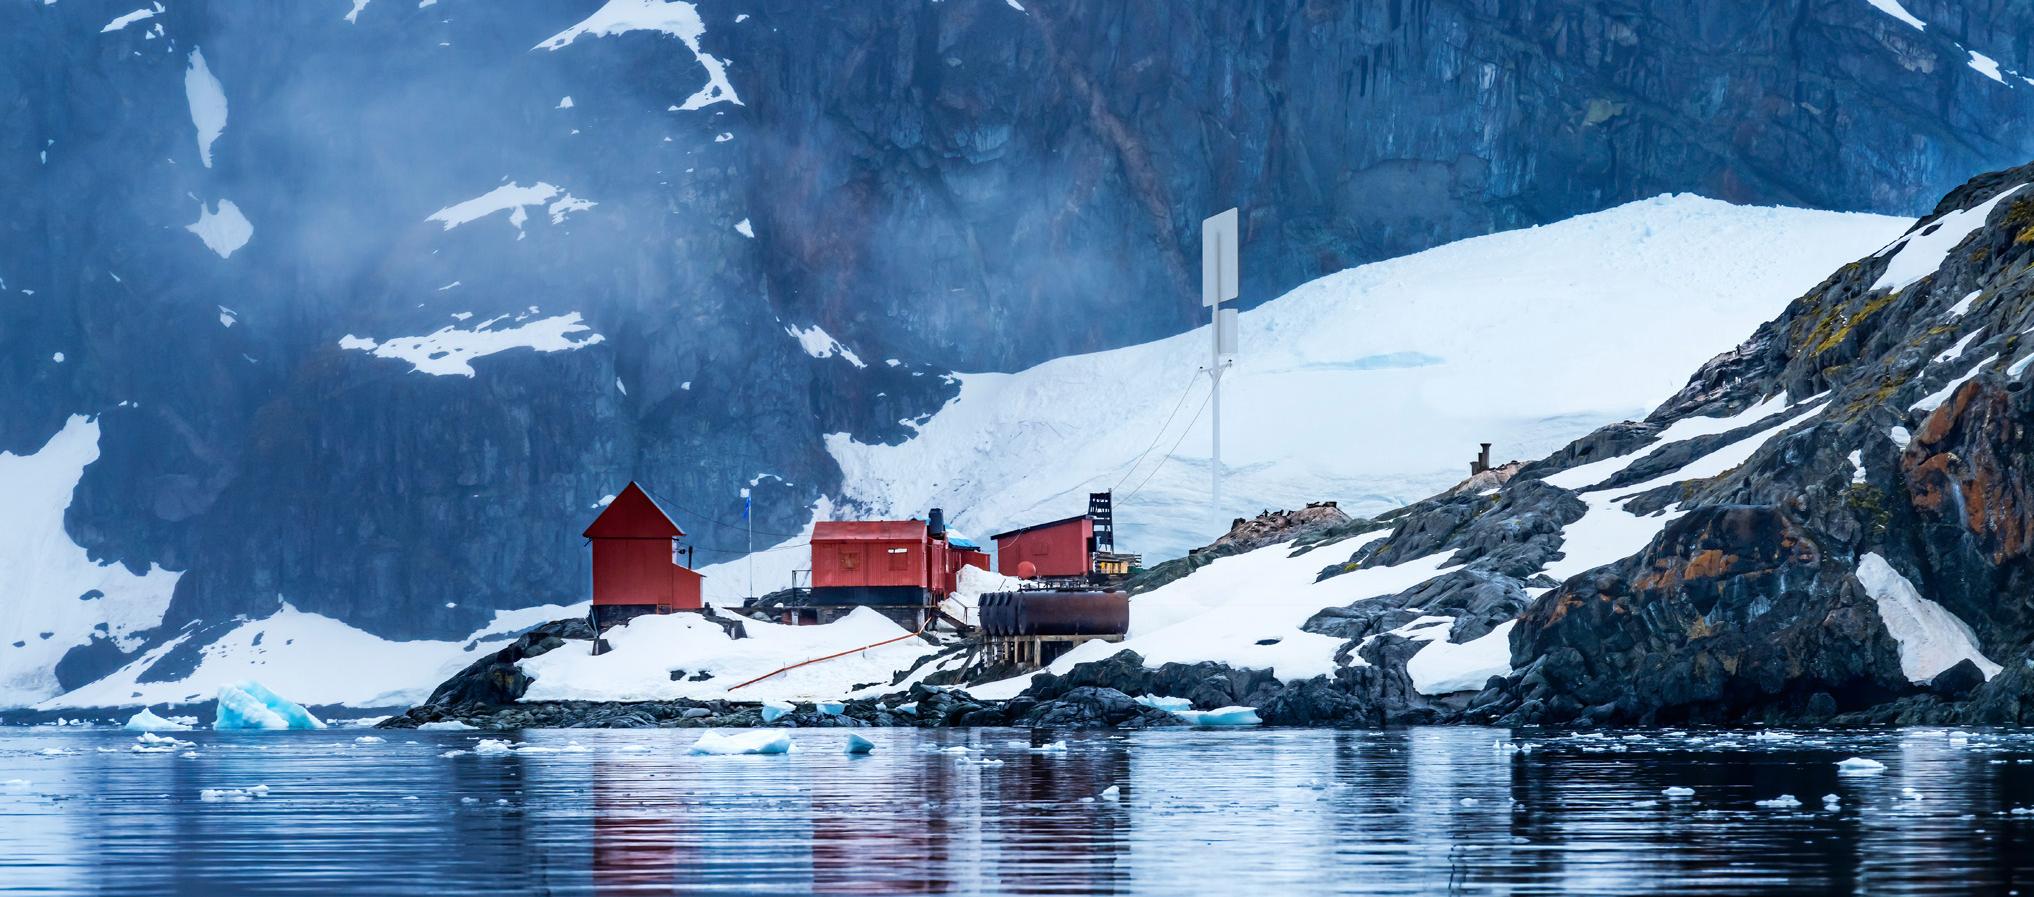 Emrod's wireless transmission antenna arctic station use case